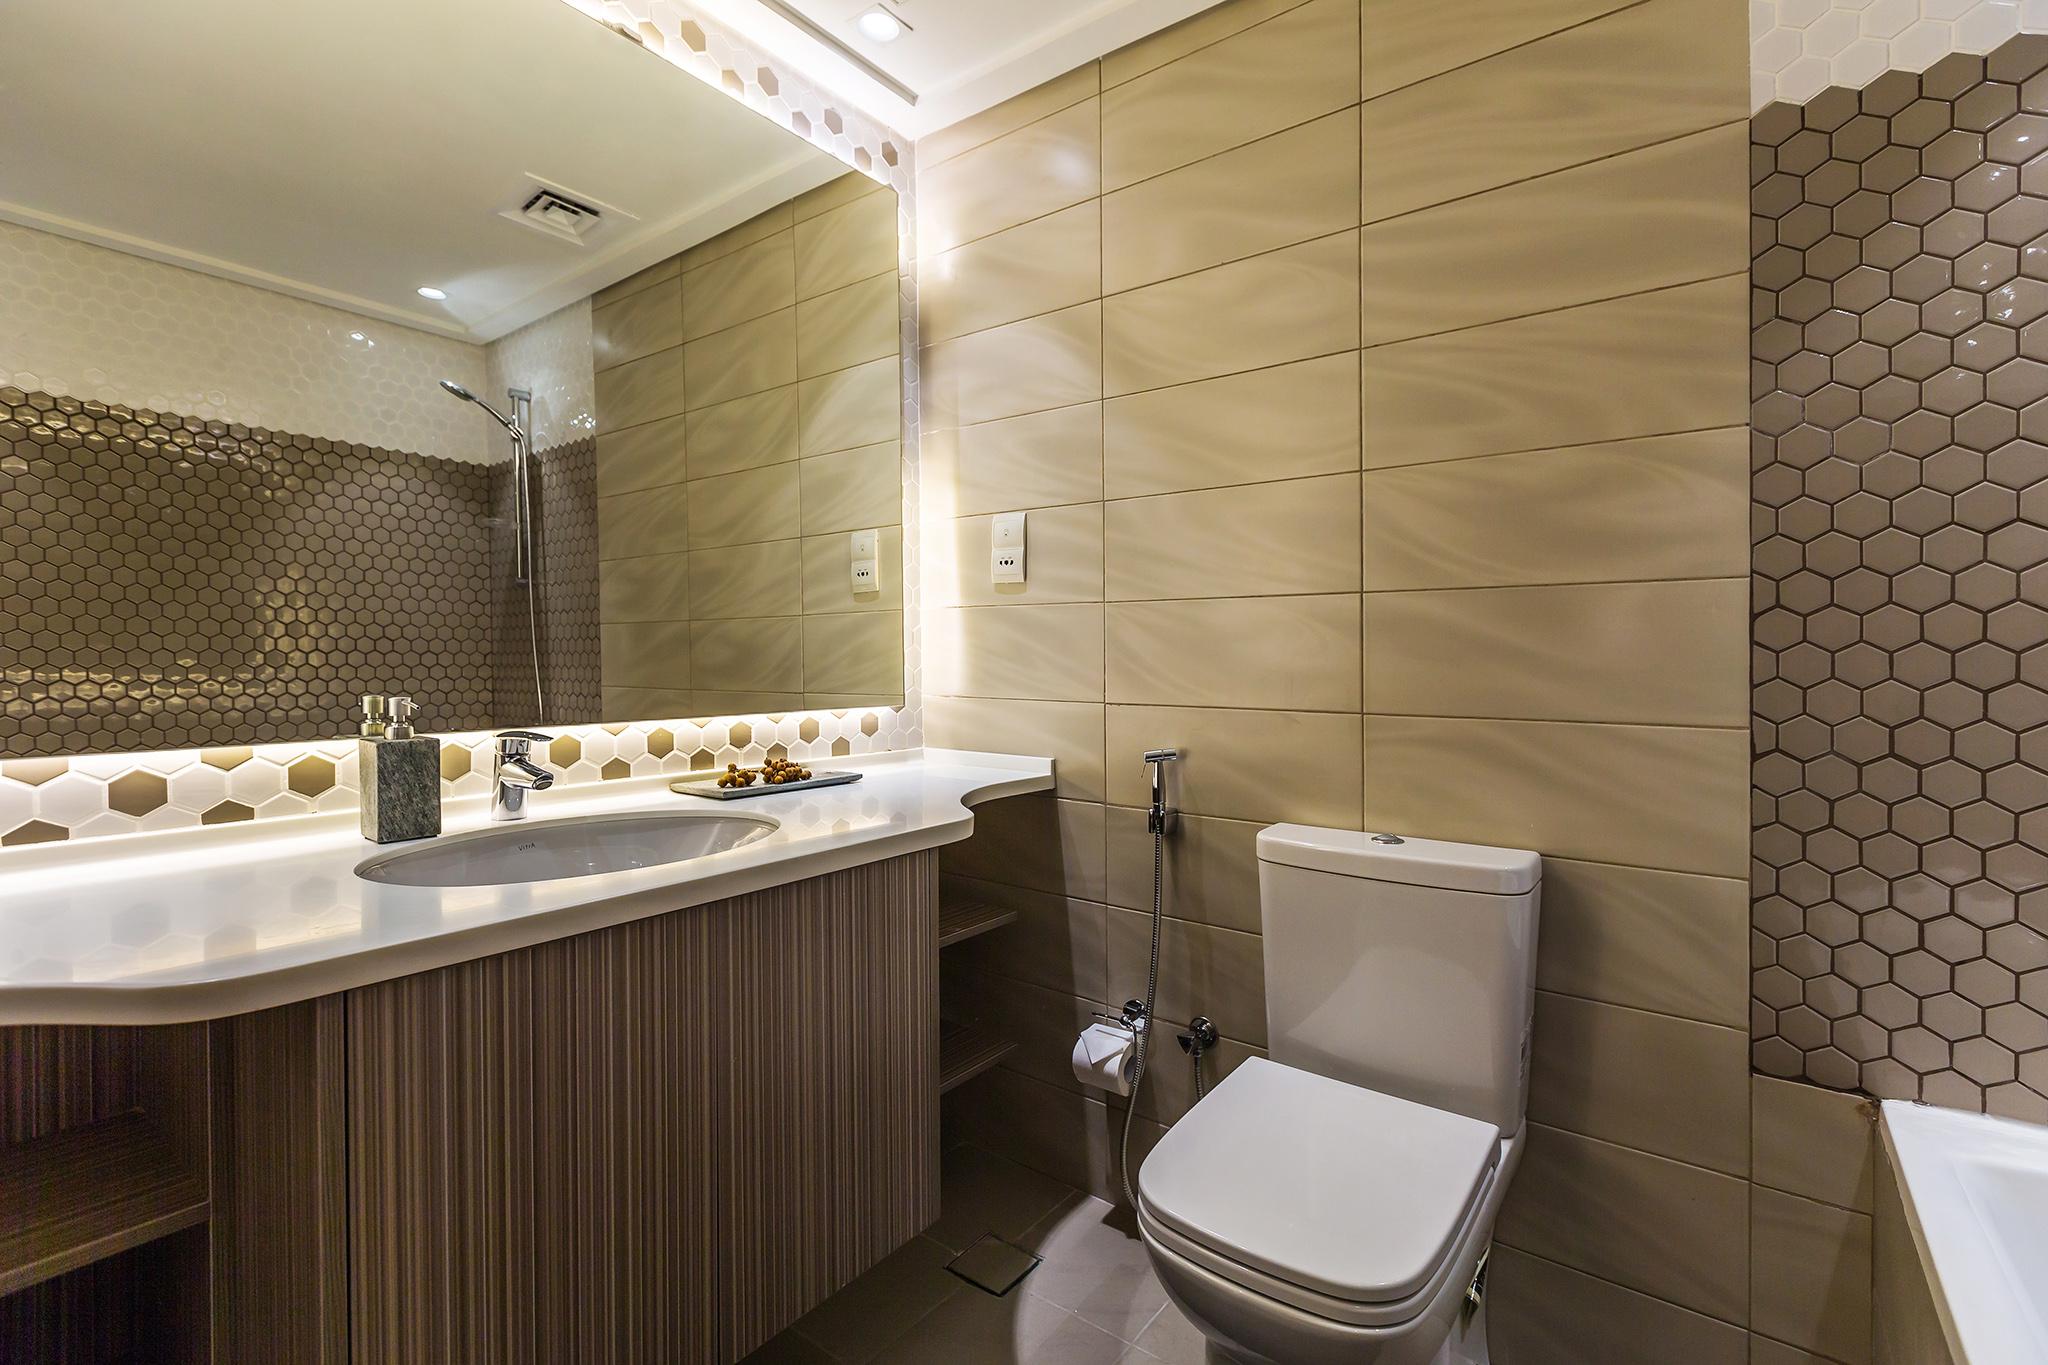 En-suite for each bedroom with contemporary design